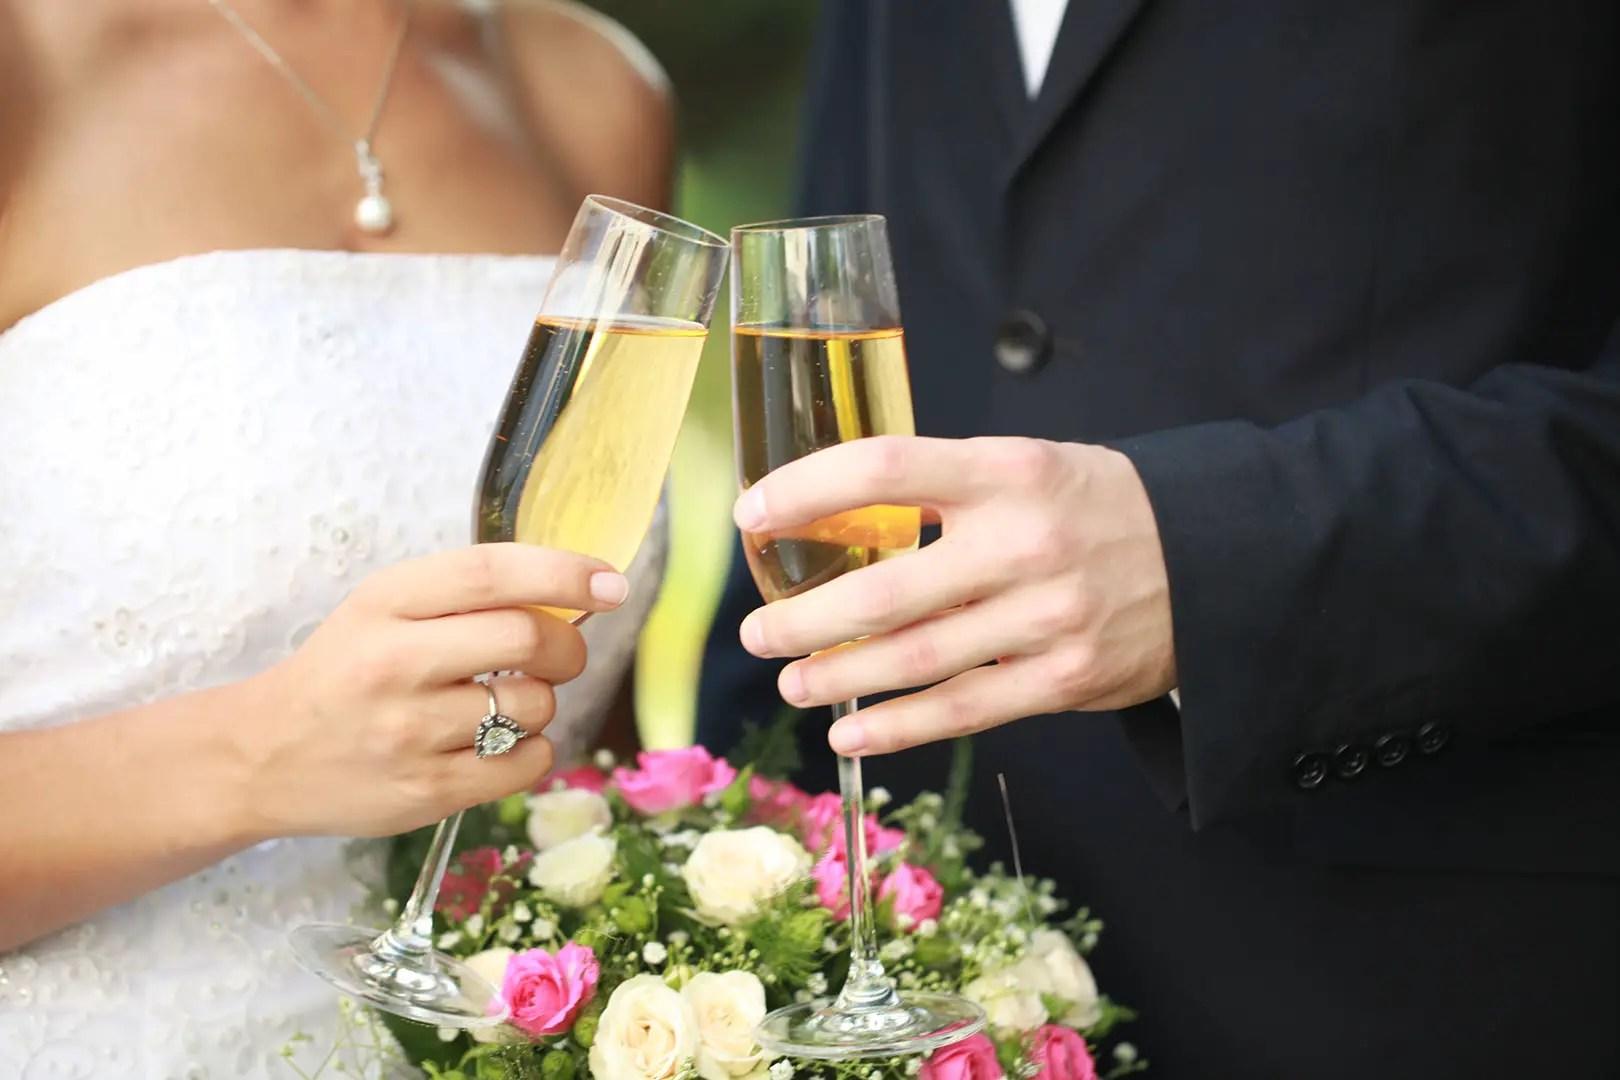 I Am Australian I Am Planning To Marry A Filipina Should -4812